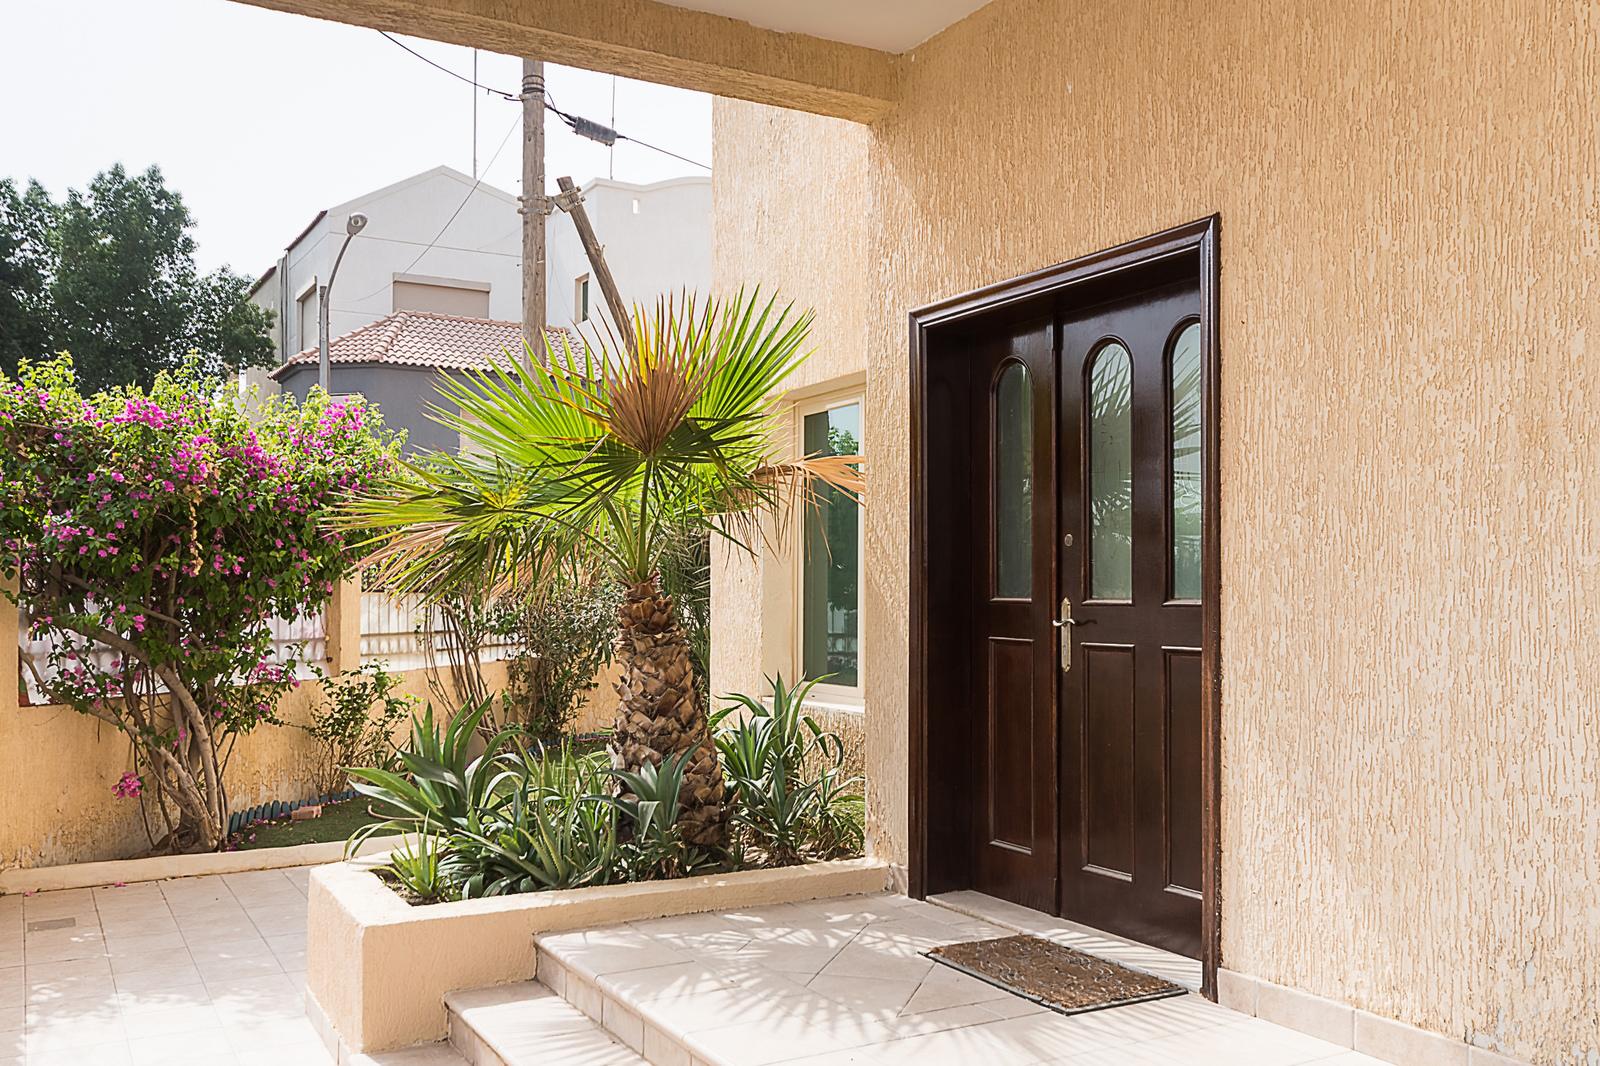 Abu Al Hasania – unfurnished, five bedroom villa w/garden